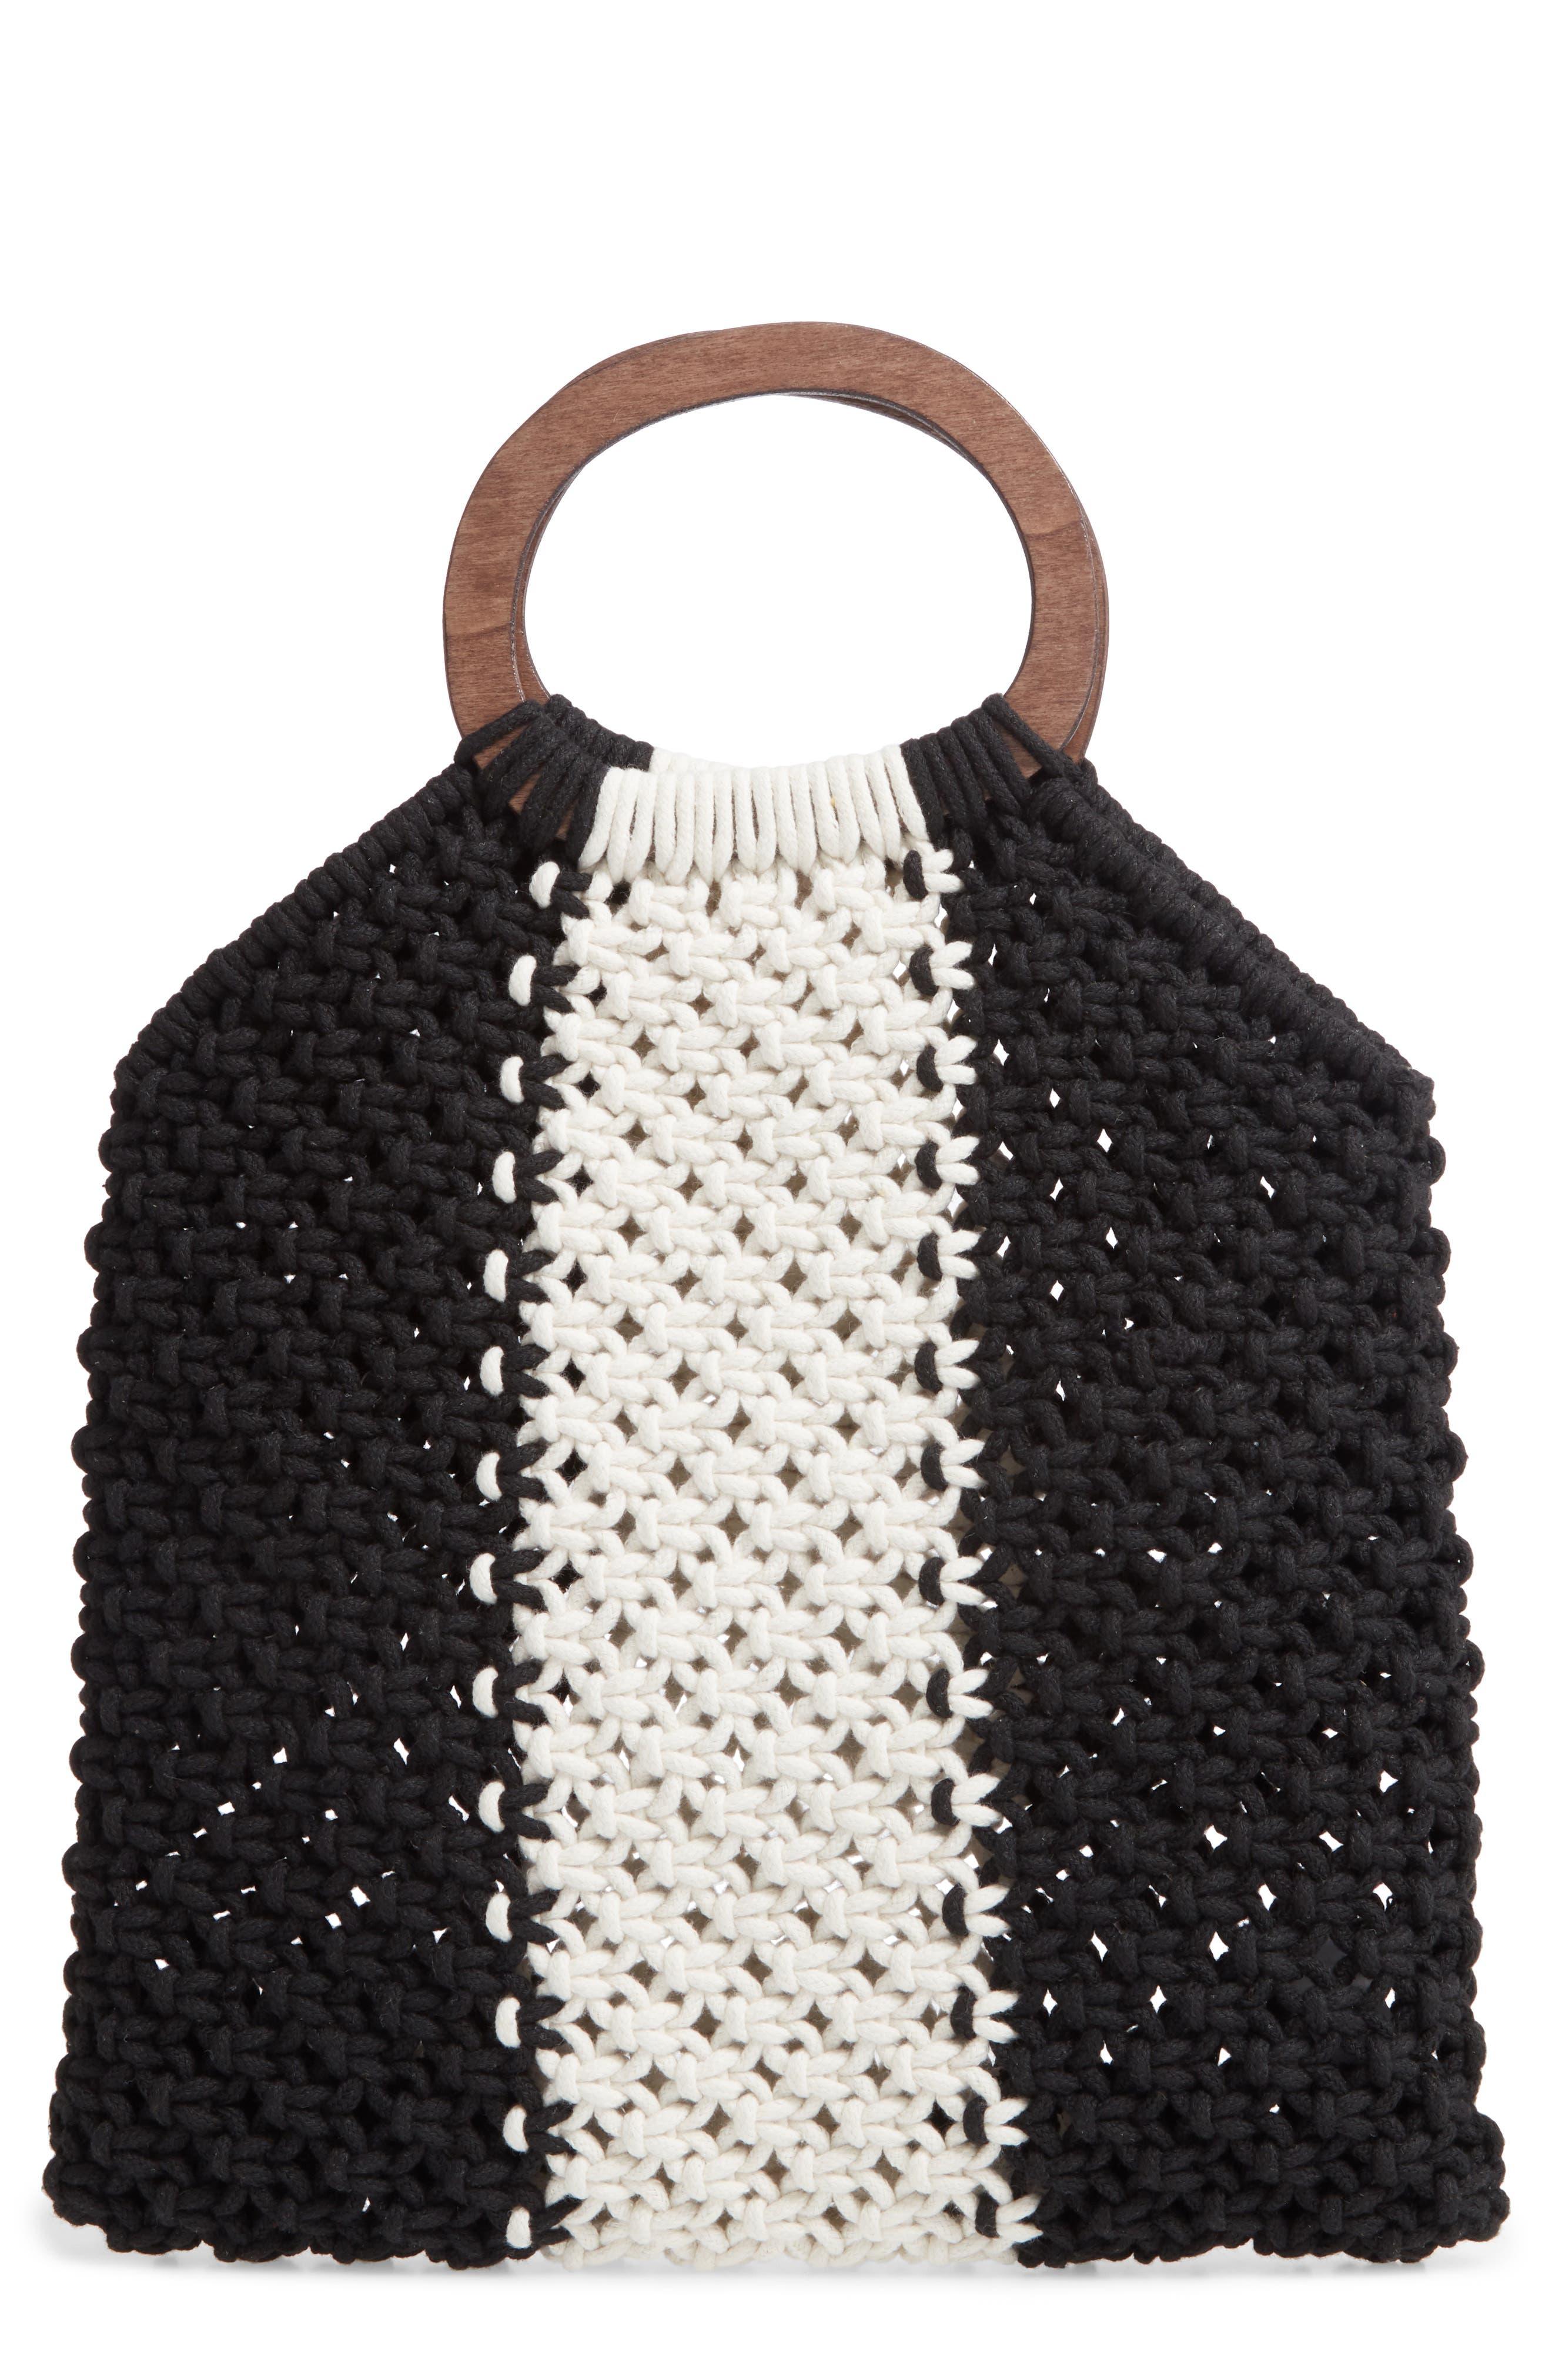 Mali + Lili Riley Stripe Knit Bag